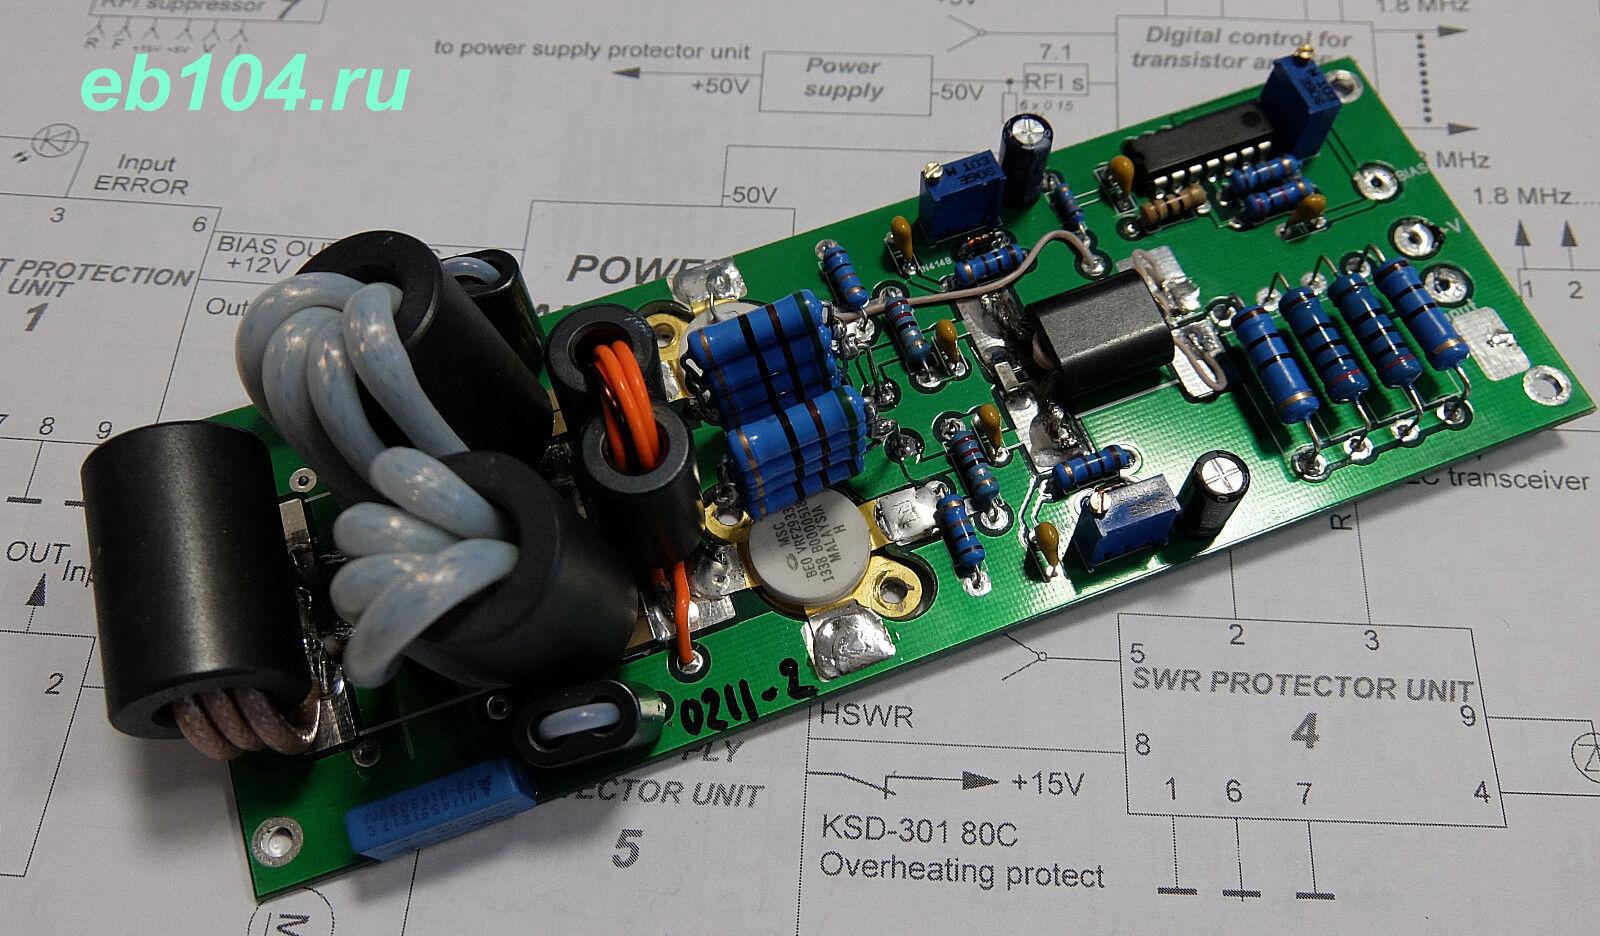 300w Amplifier Pallet Blf278 300 Watt Class D Audio Board Tas5613 Mono Power Amp Hf 18 30 Mhz